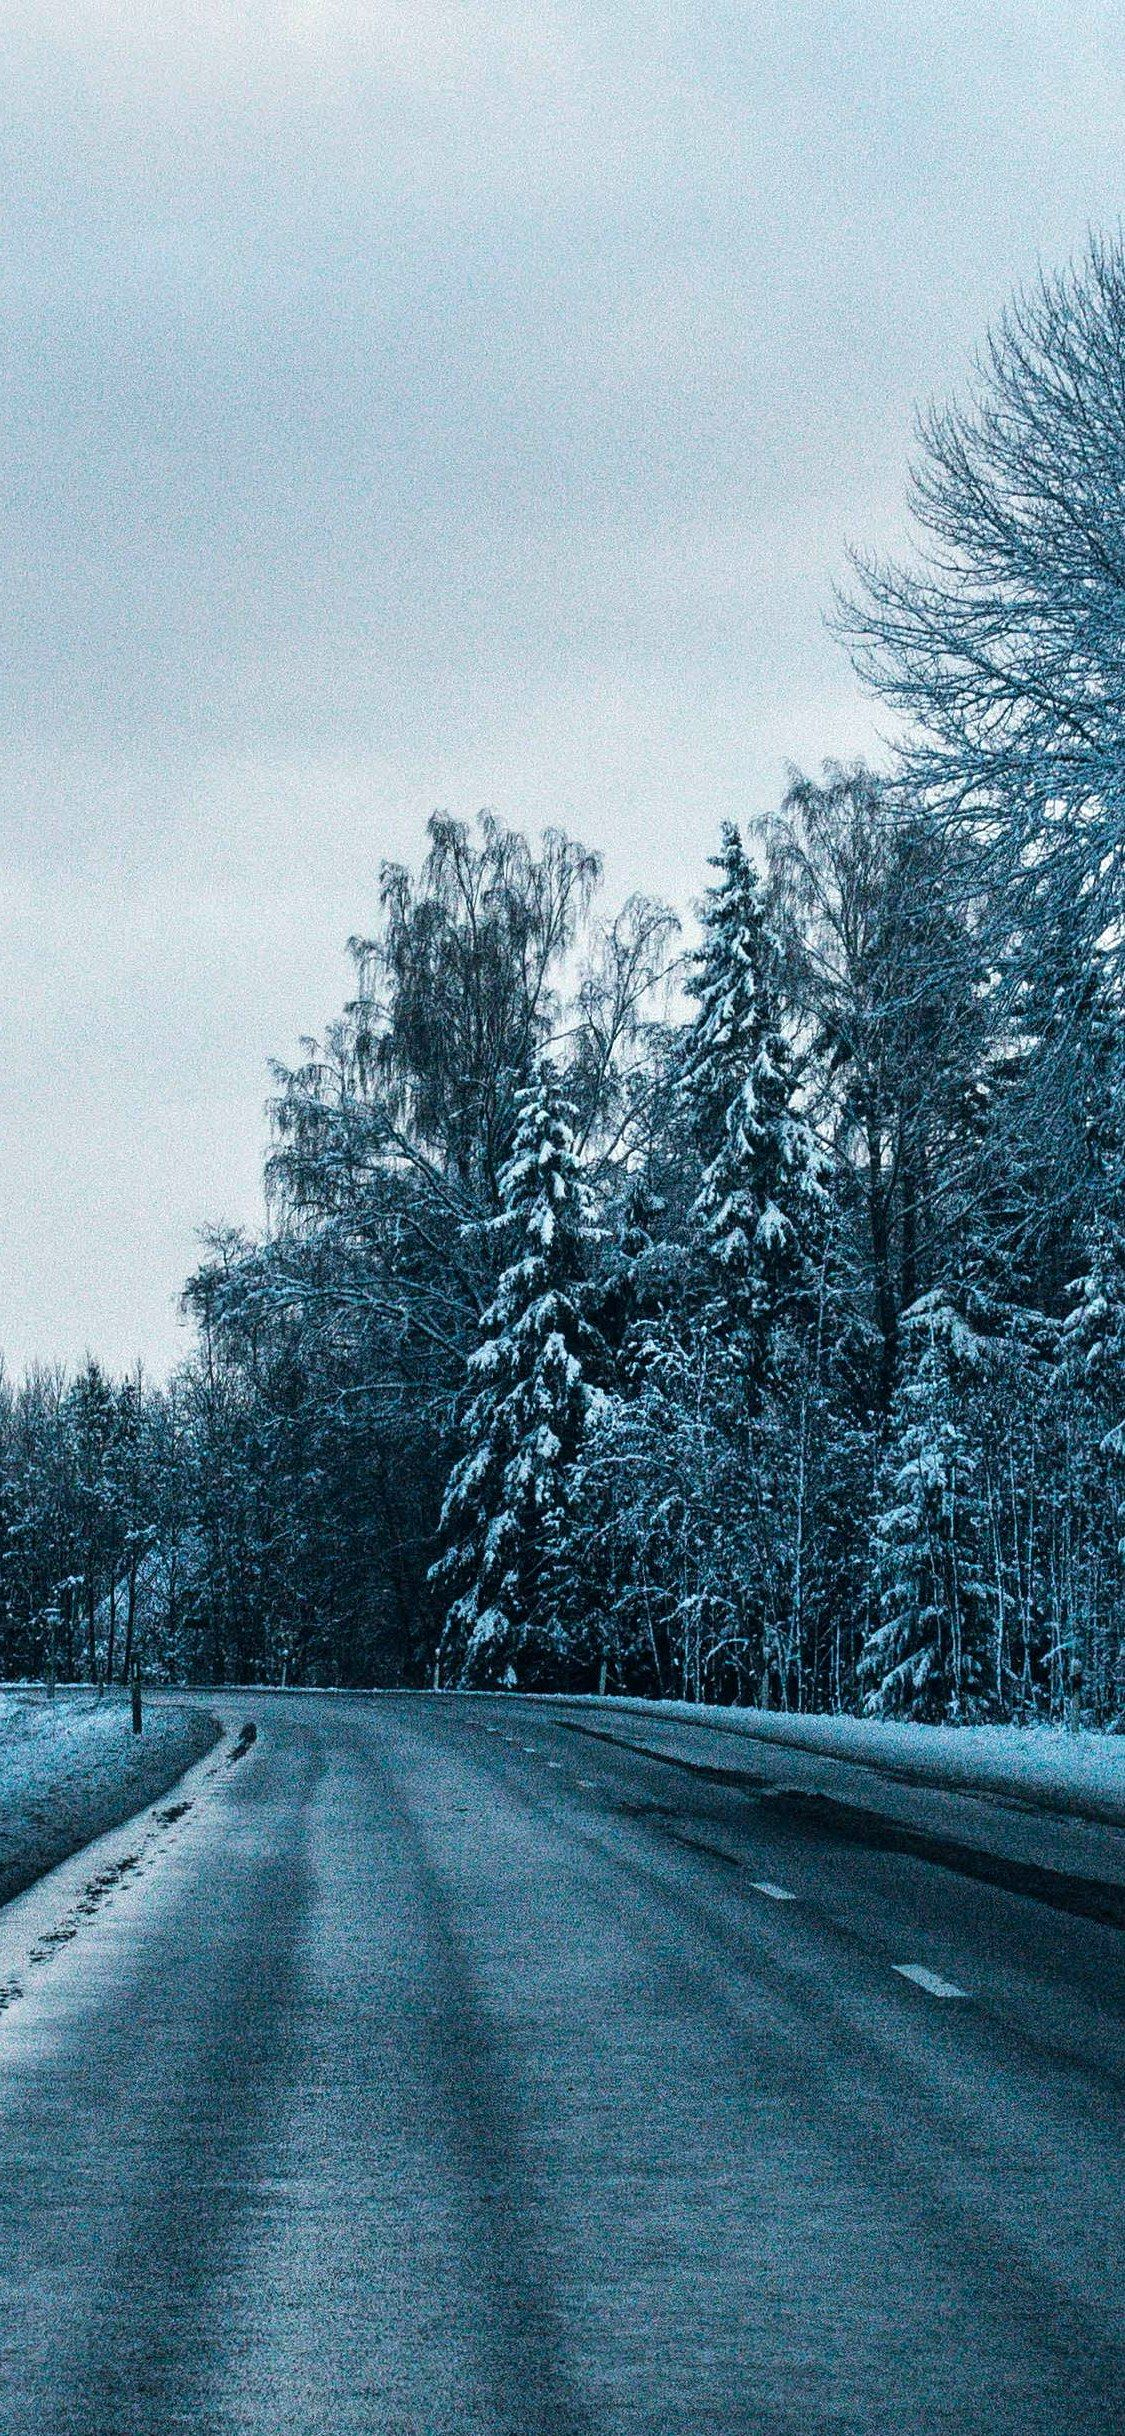 Road Winter Trees Turn Wallpaper Iphone X Wallpaper Winter Trees Wallpaper Iphone Wallpaper Hd wallpaper sunset horizon road winter